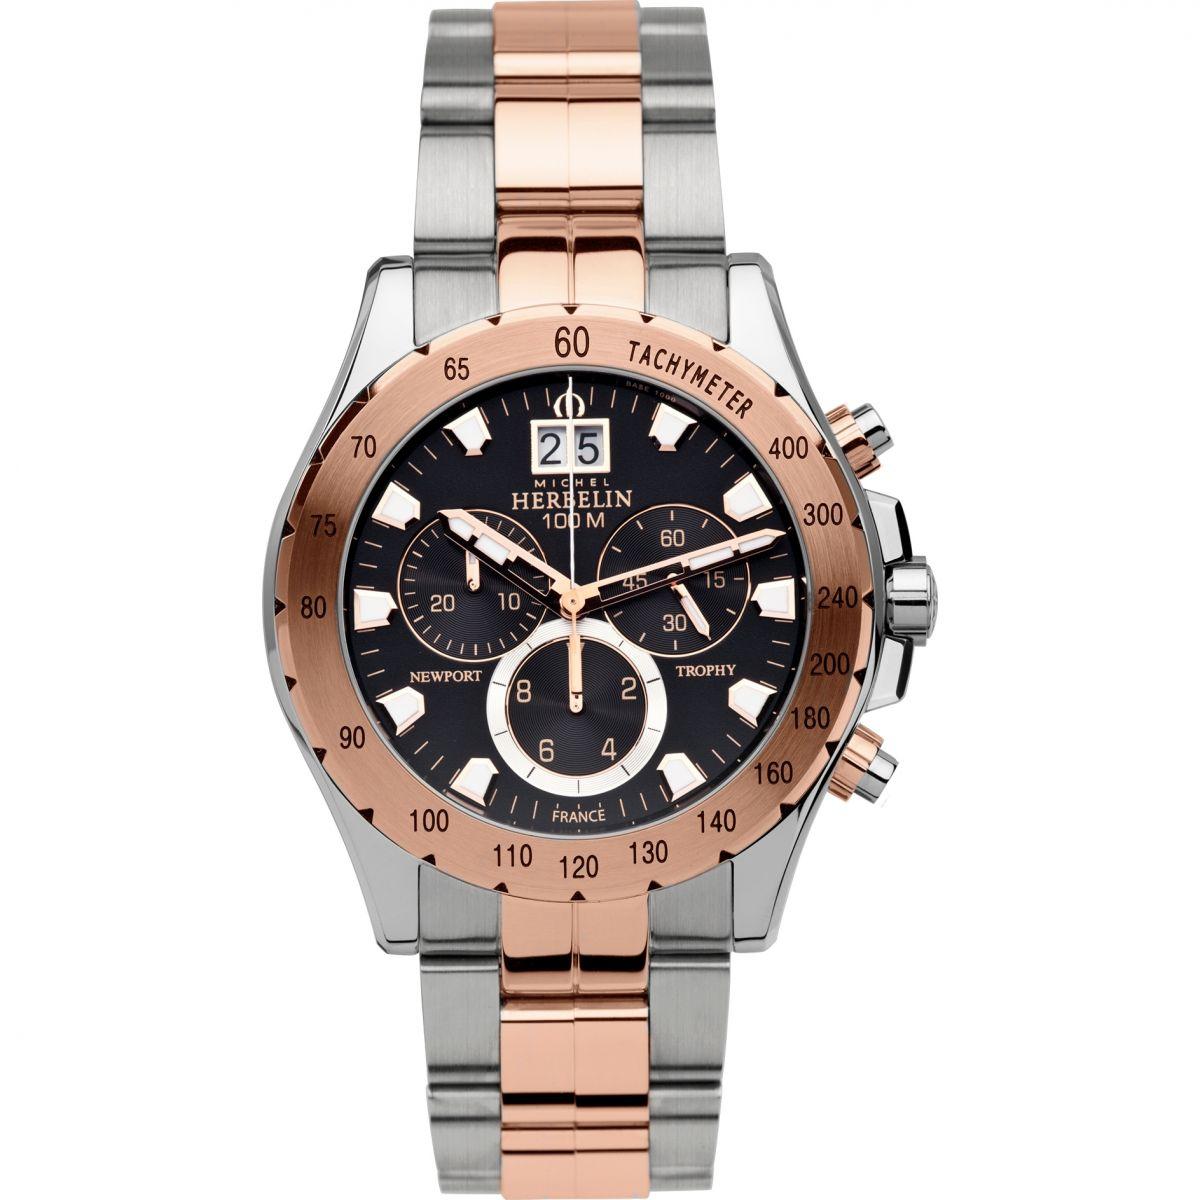 gents michel herbelin newport trophy chronograph watch. Black Bedroom Furniture Sets. Home Design Ideas